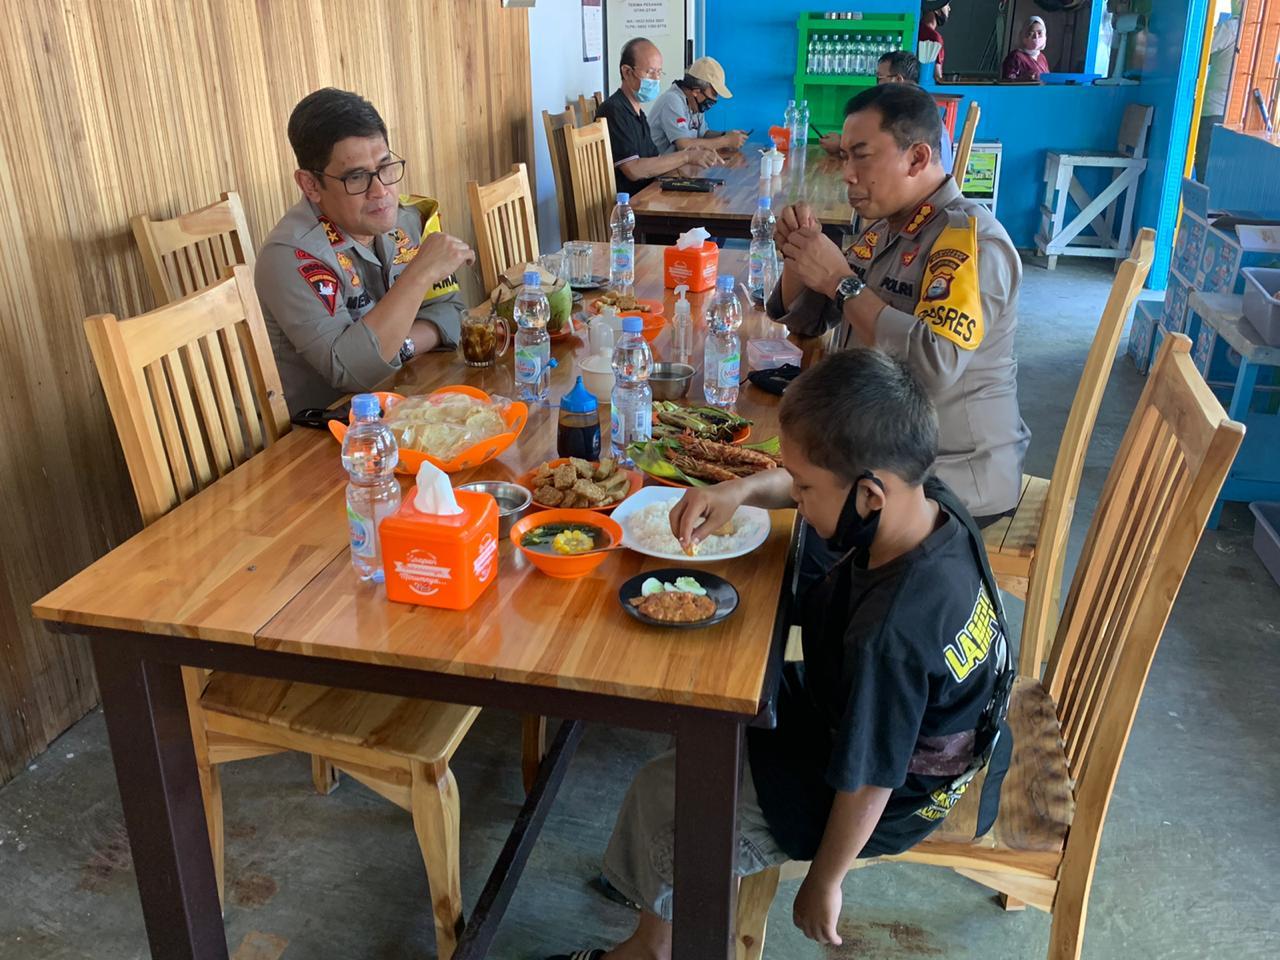 Traktir Makan siang bocah Penjual Asinan, Kapolda Dapat Pujian Warga Sulsel